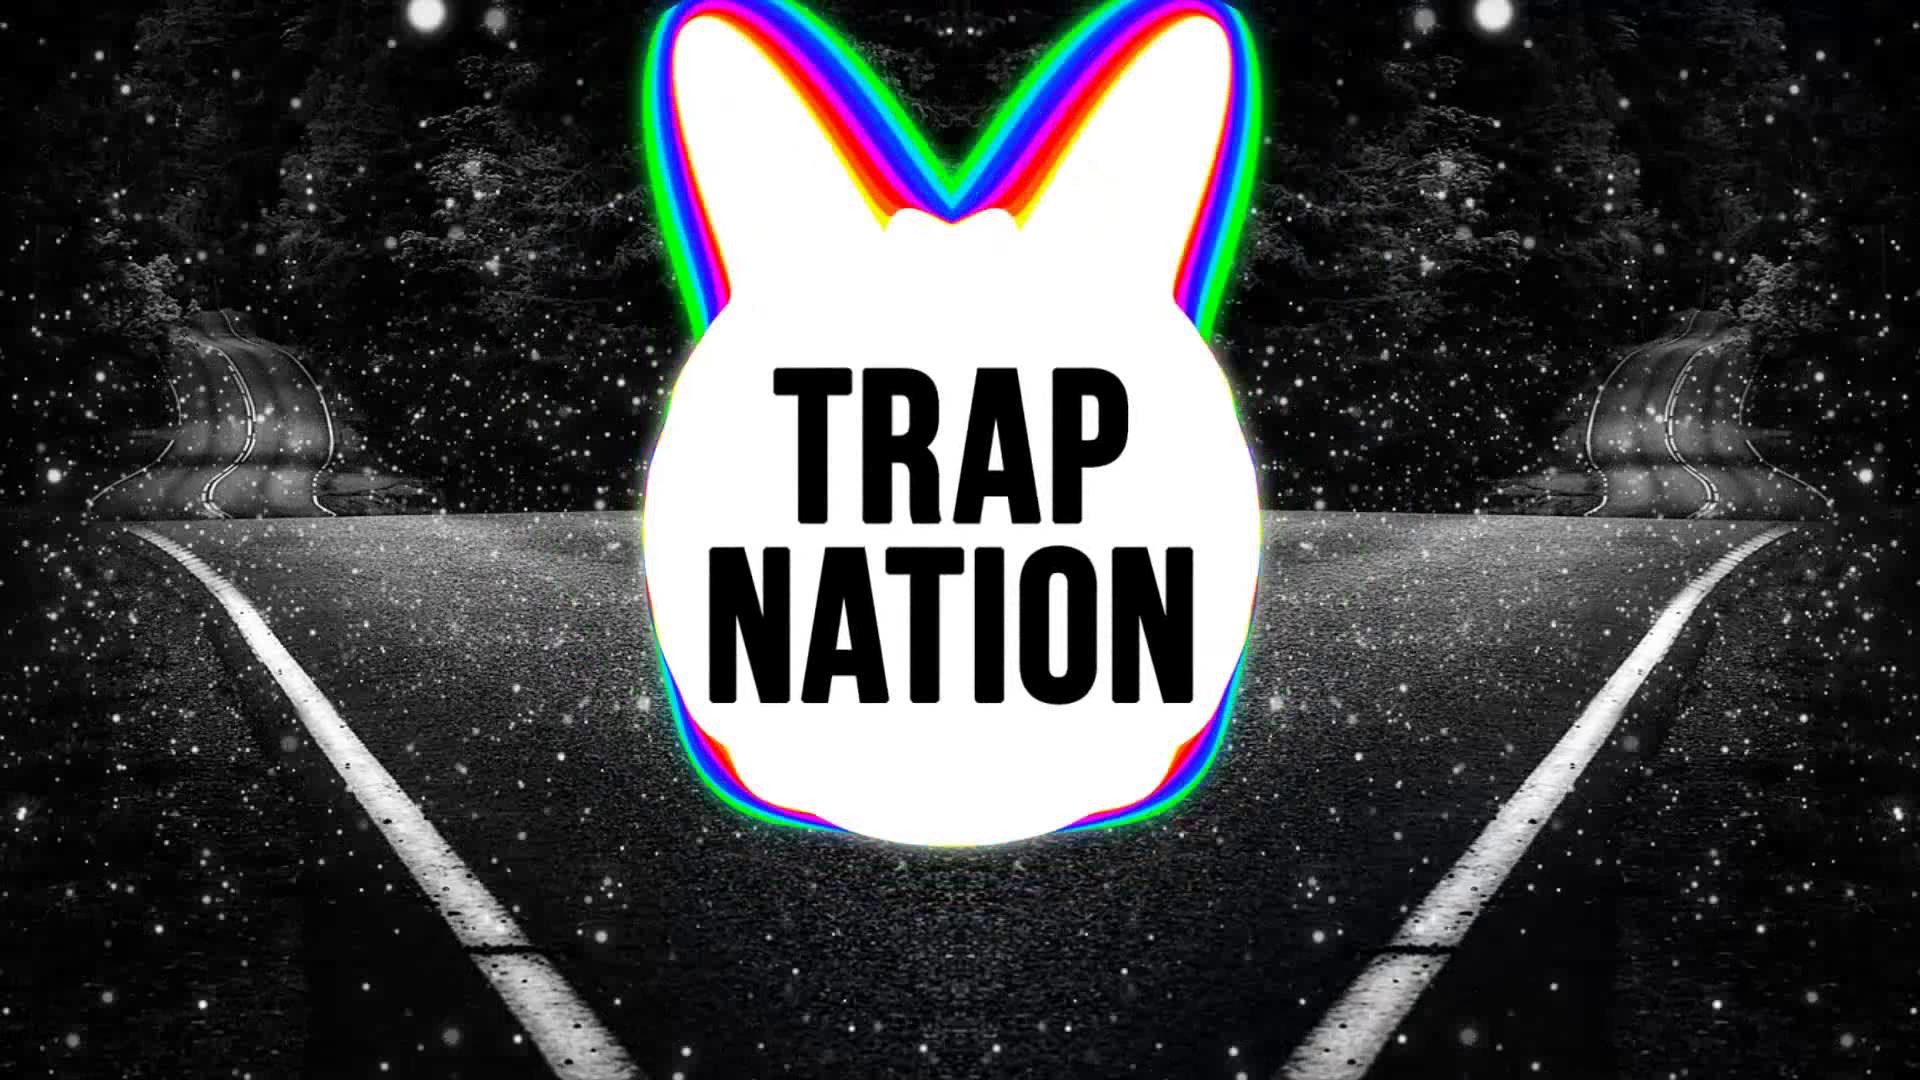 Trap Nation Live Wallpaper - Trap Nation Music Logo - HD Wallpaper